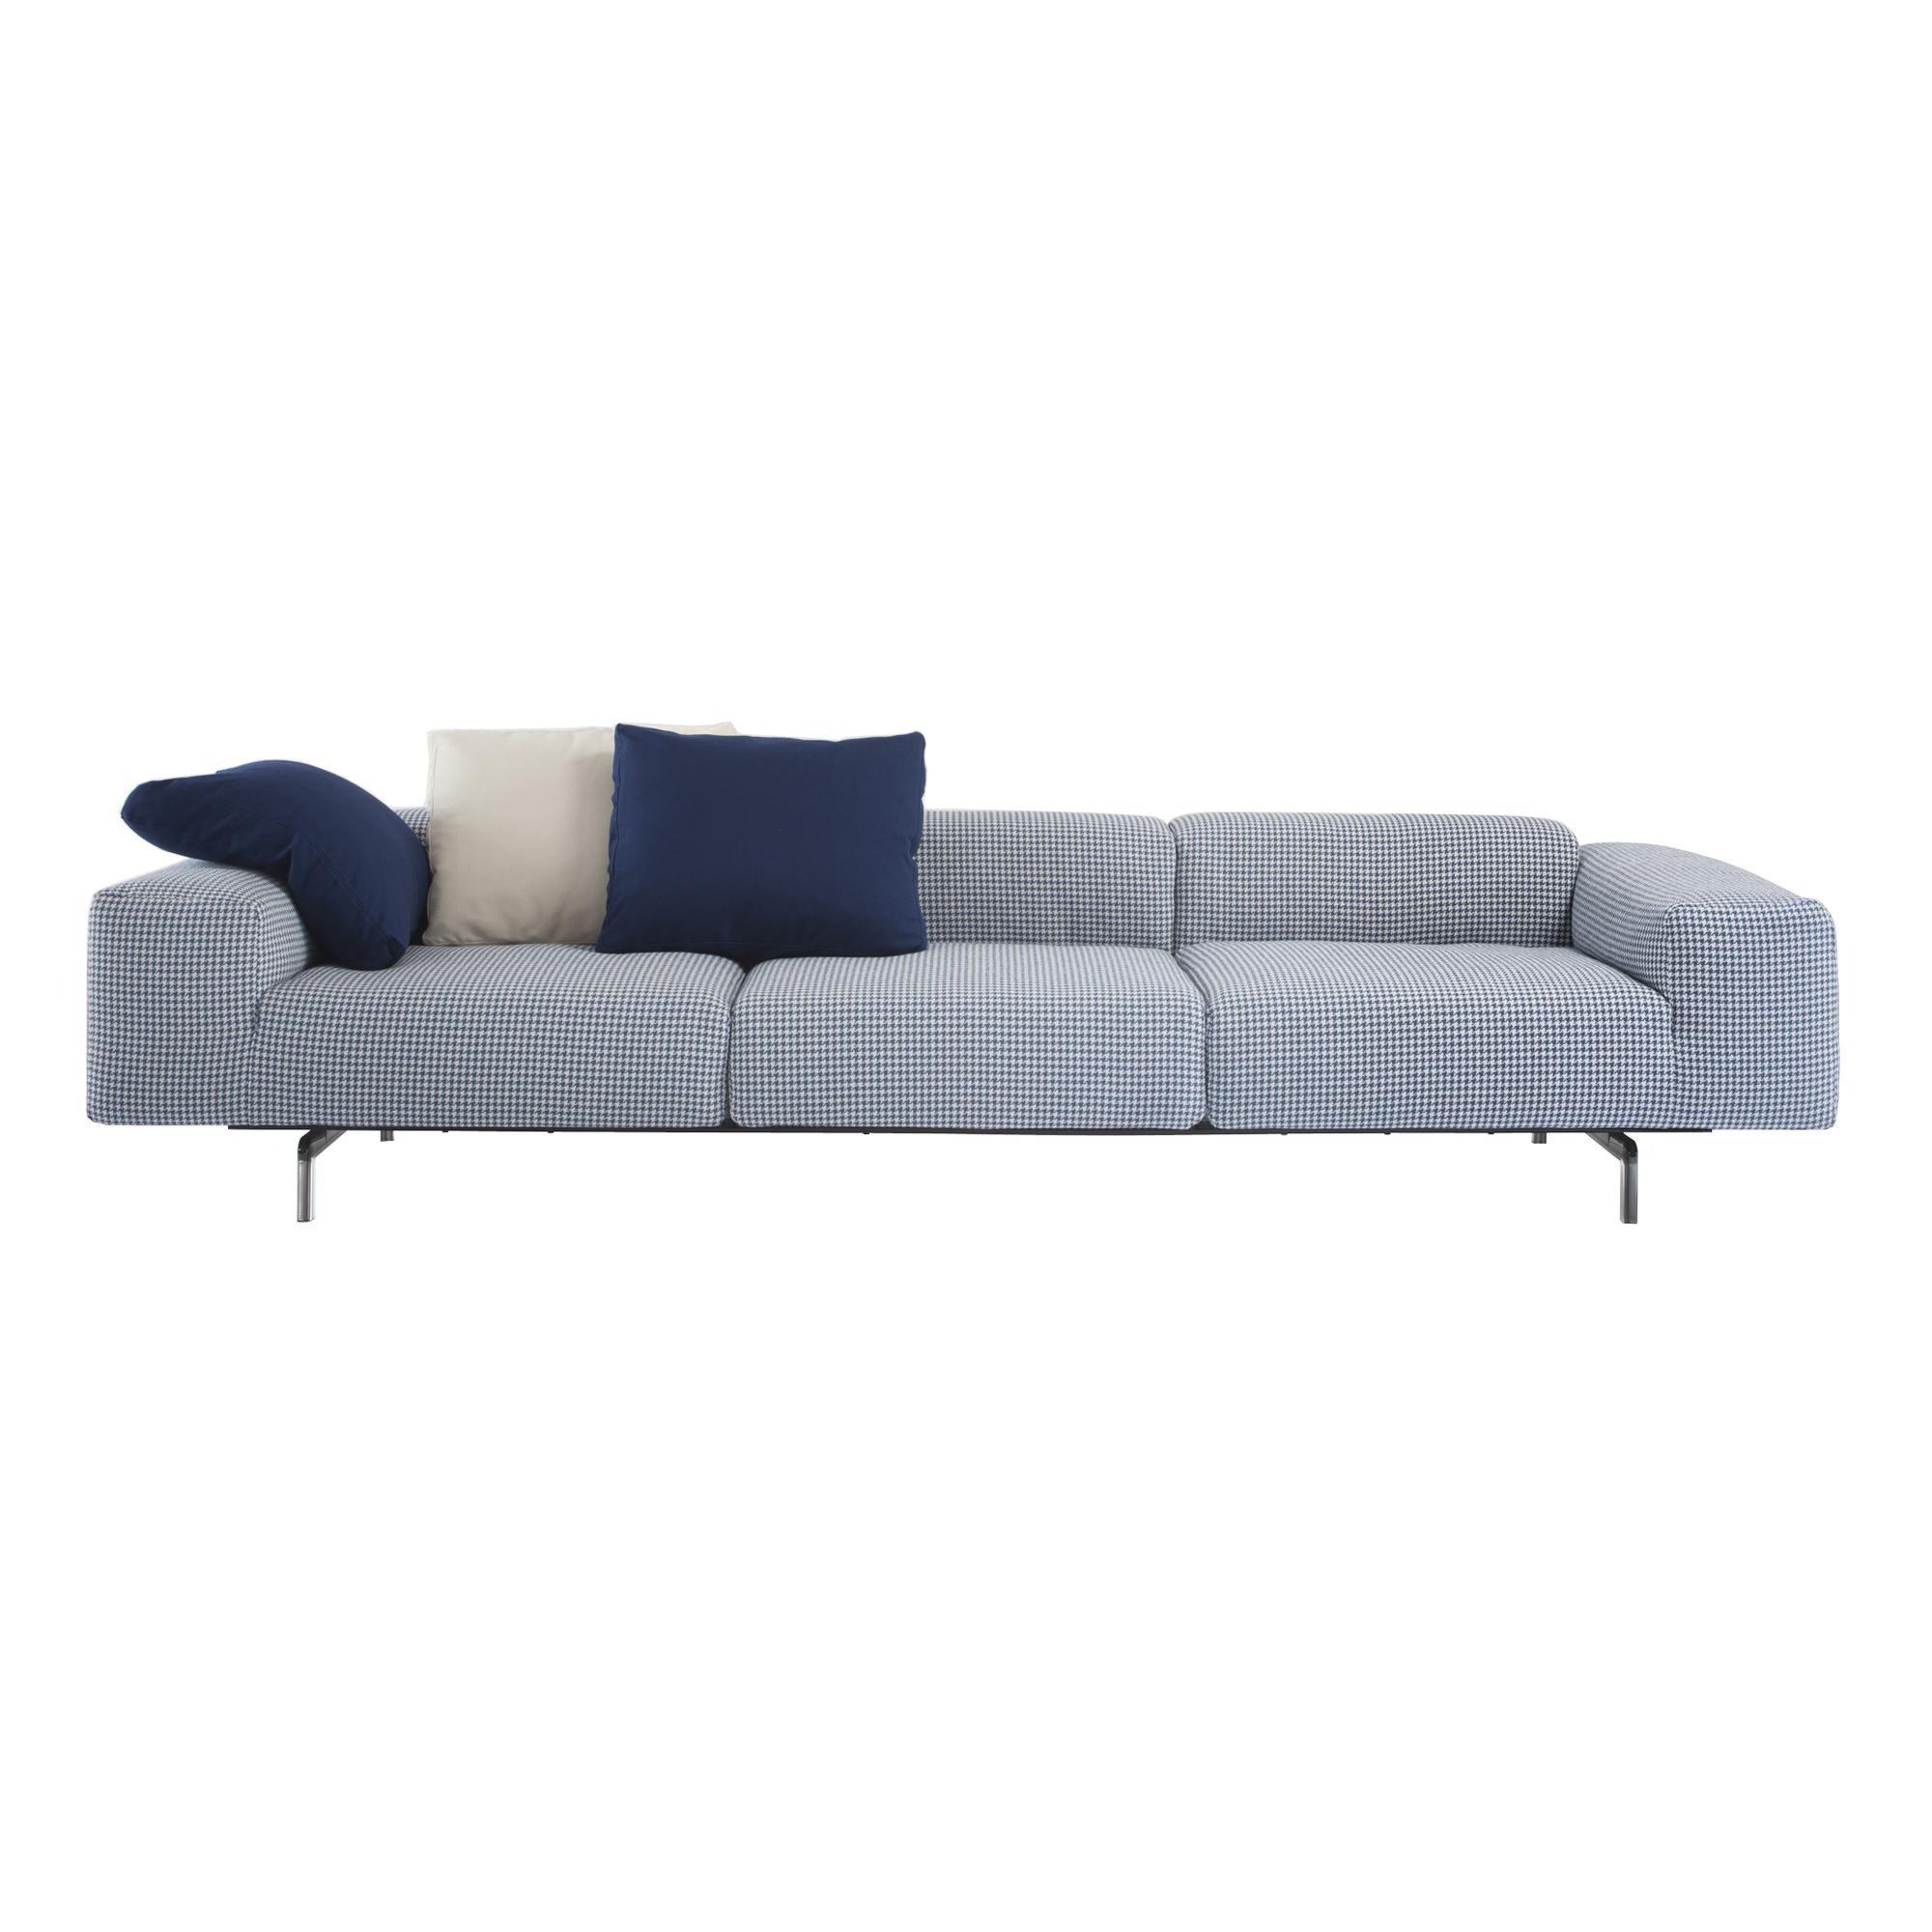 kartell sofa largo l shaped designs 2017 3 seater ambientedirect